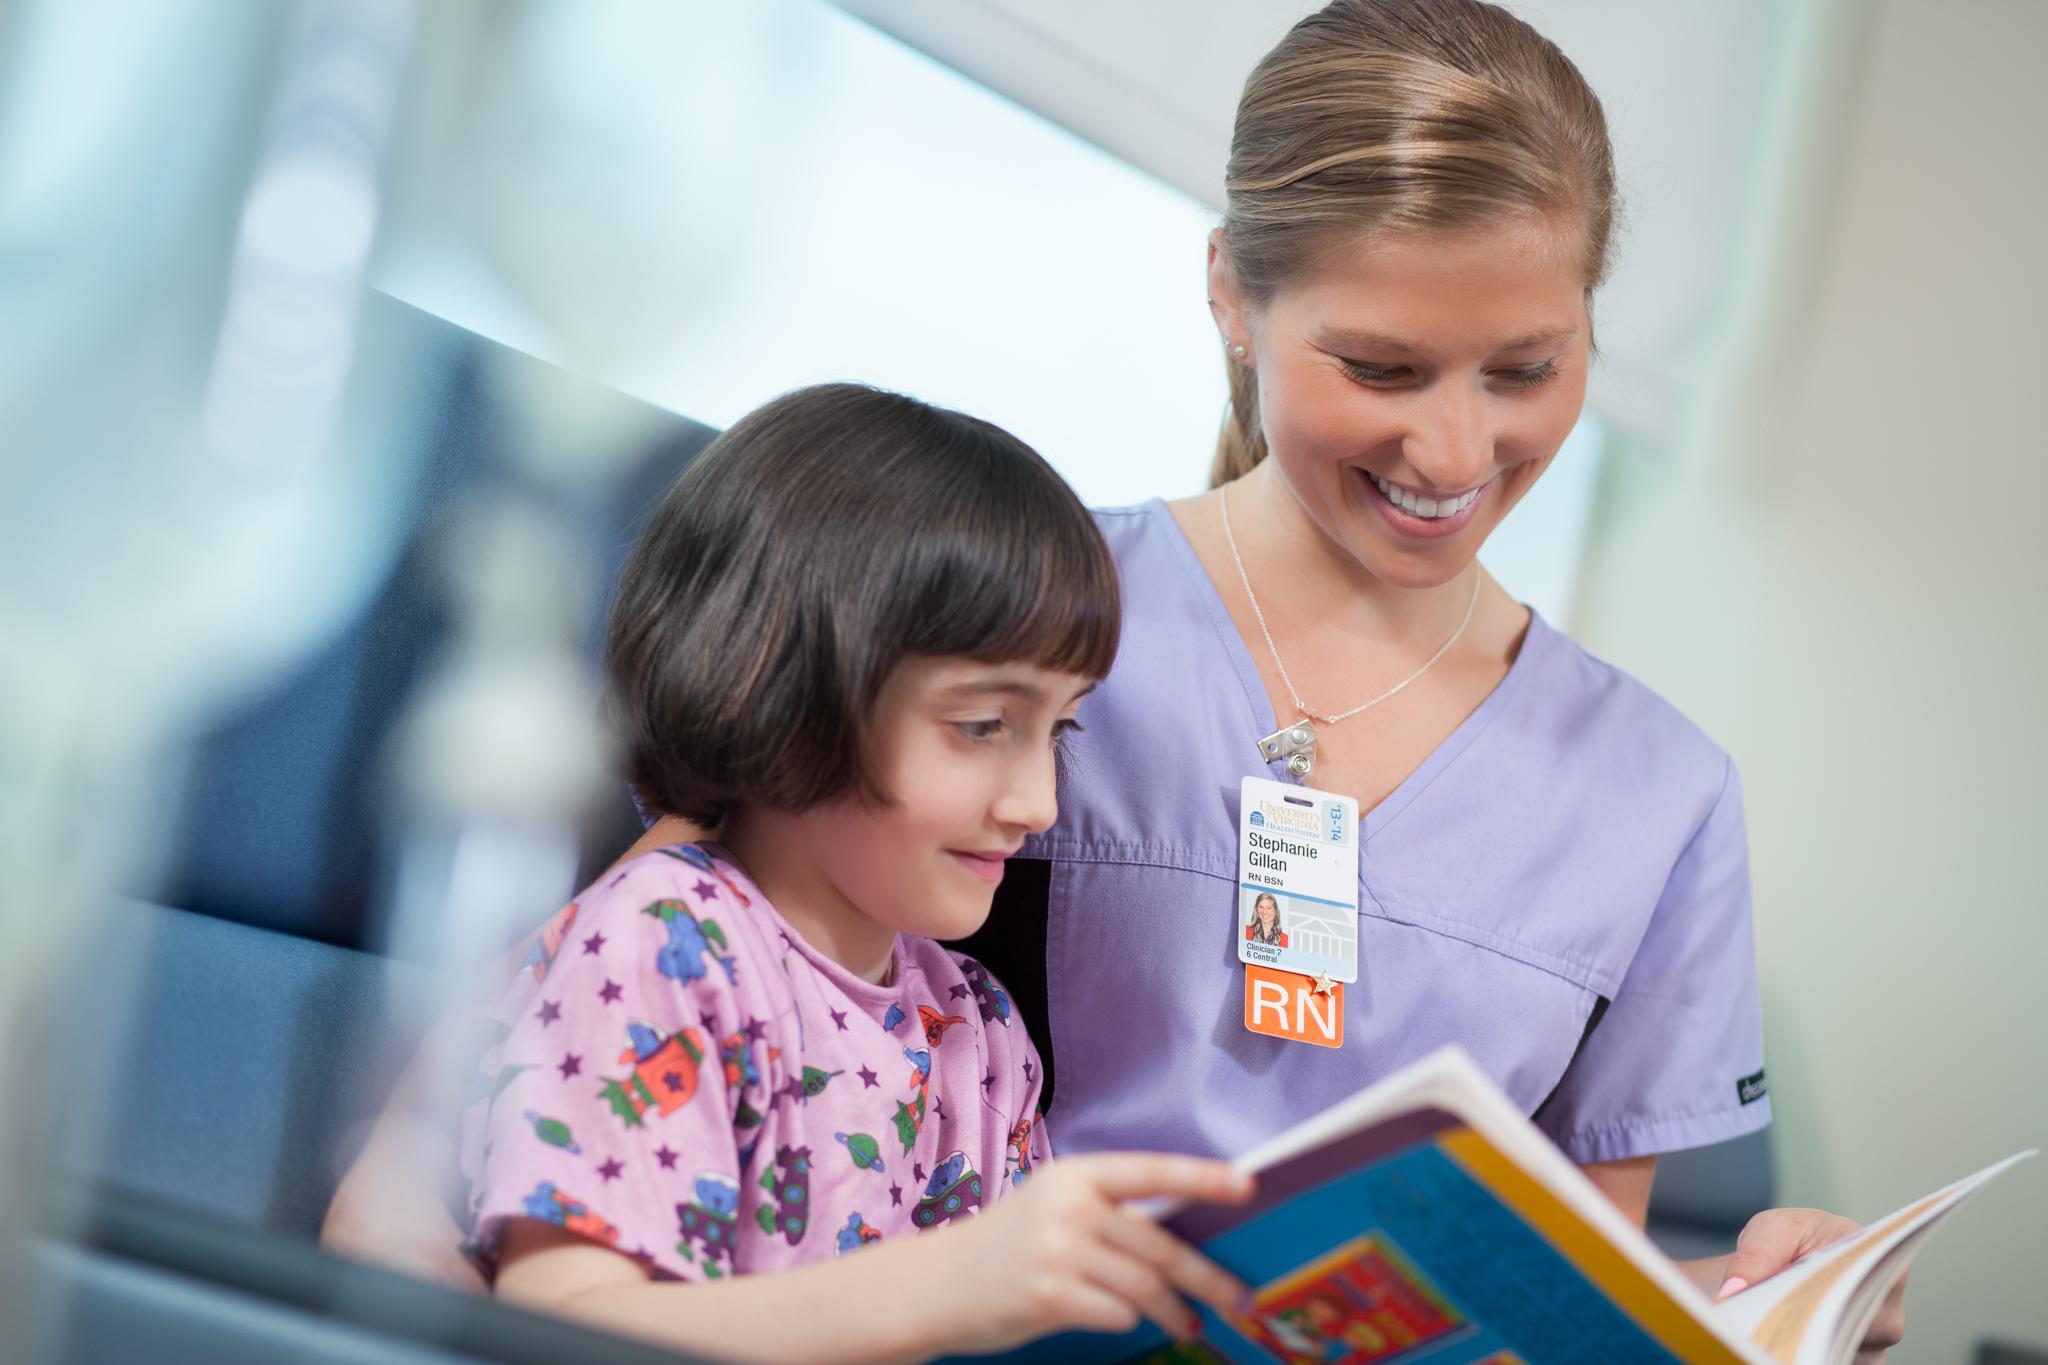 14029 Inpatient Room Nurse Stephanie and Mirabelle 003 final 02.jpg